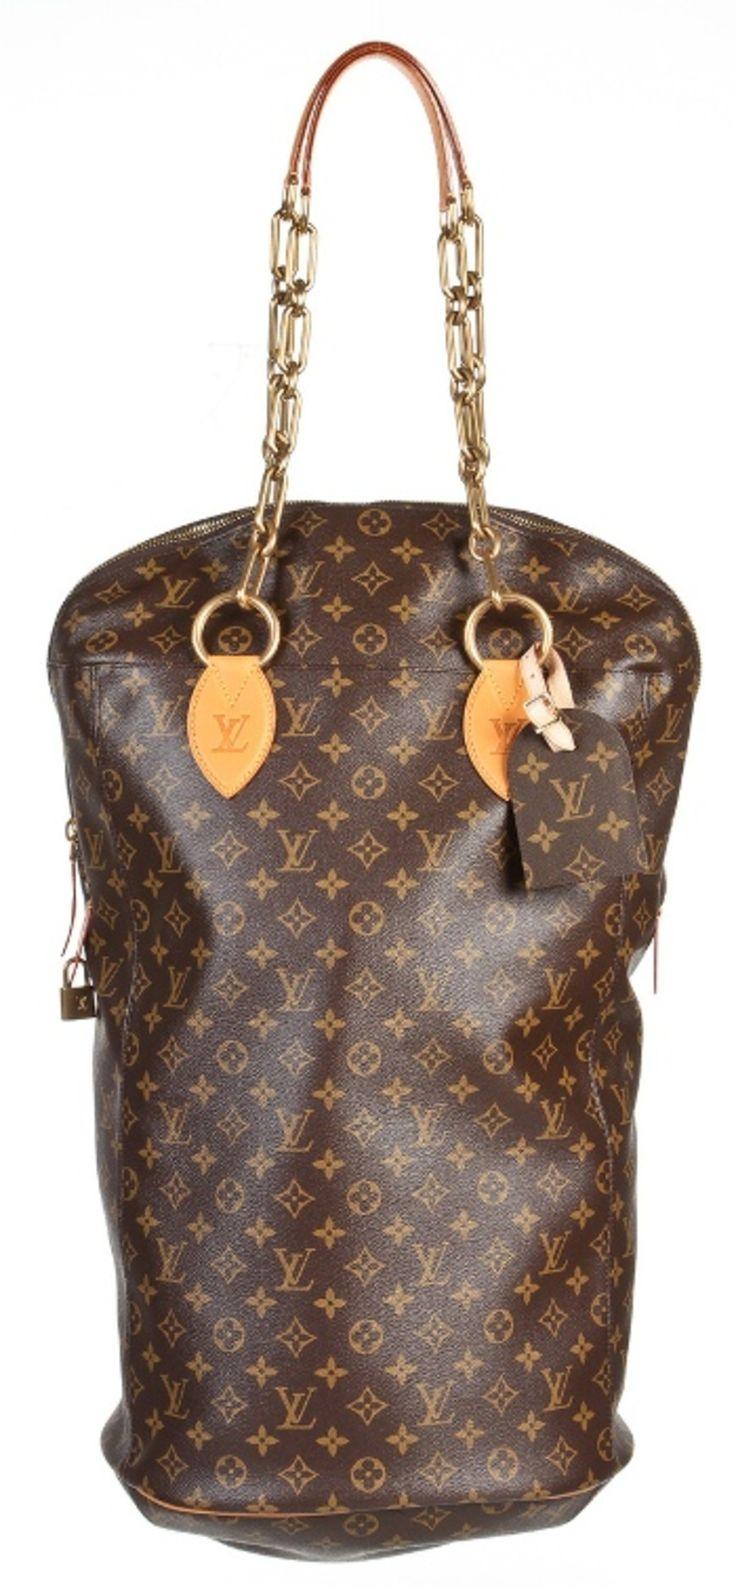 17 best images about louis vuitton bags on pinterest gucci handbags sale fendi bags and louis. Black Bedroom Furniture Sets. Home Design Ideas